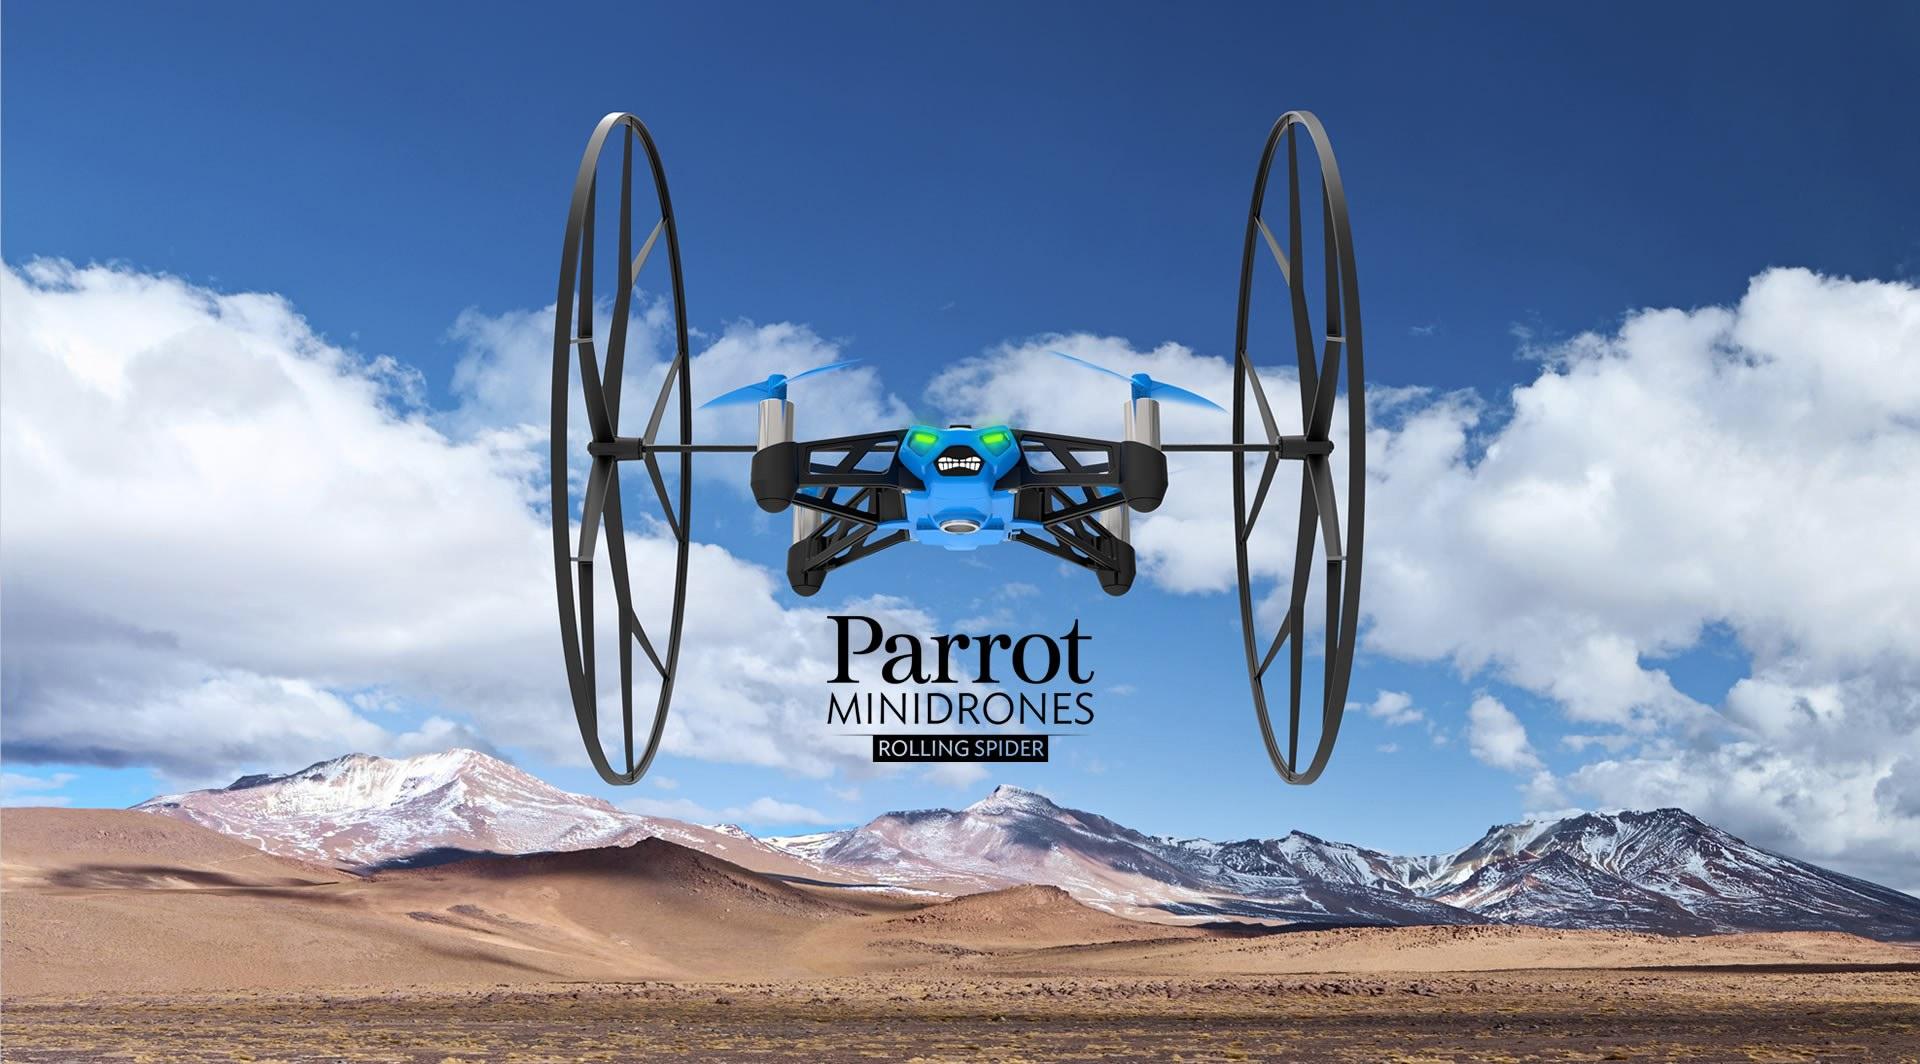 Rolling Spider de Parrot